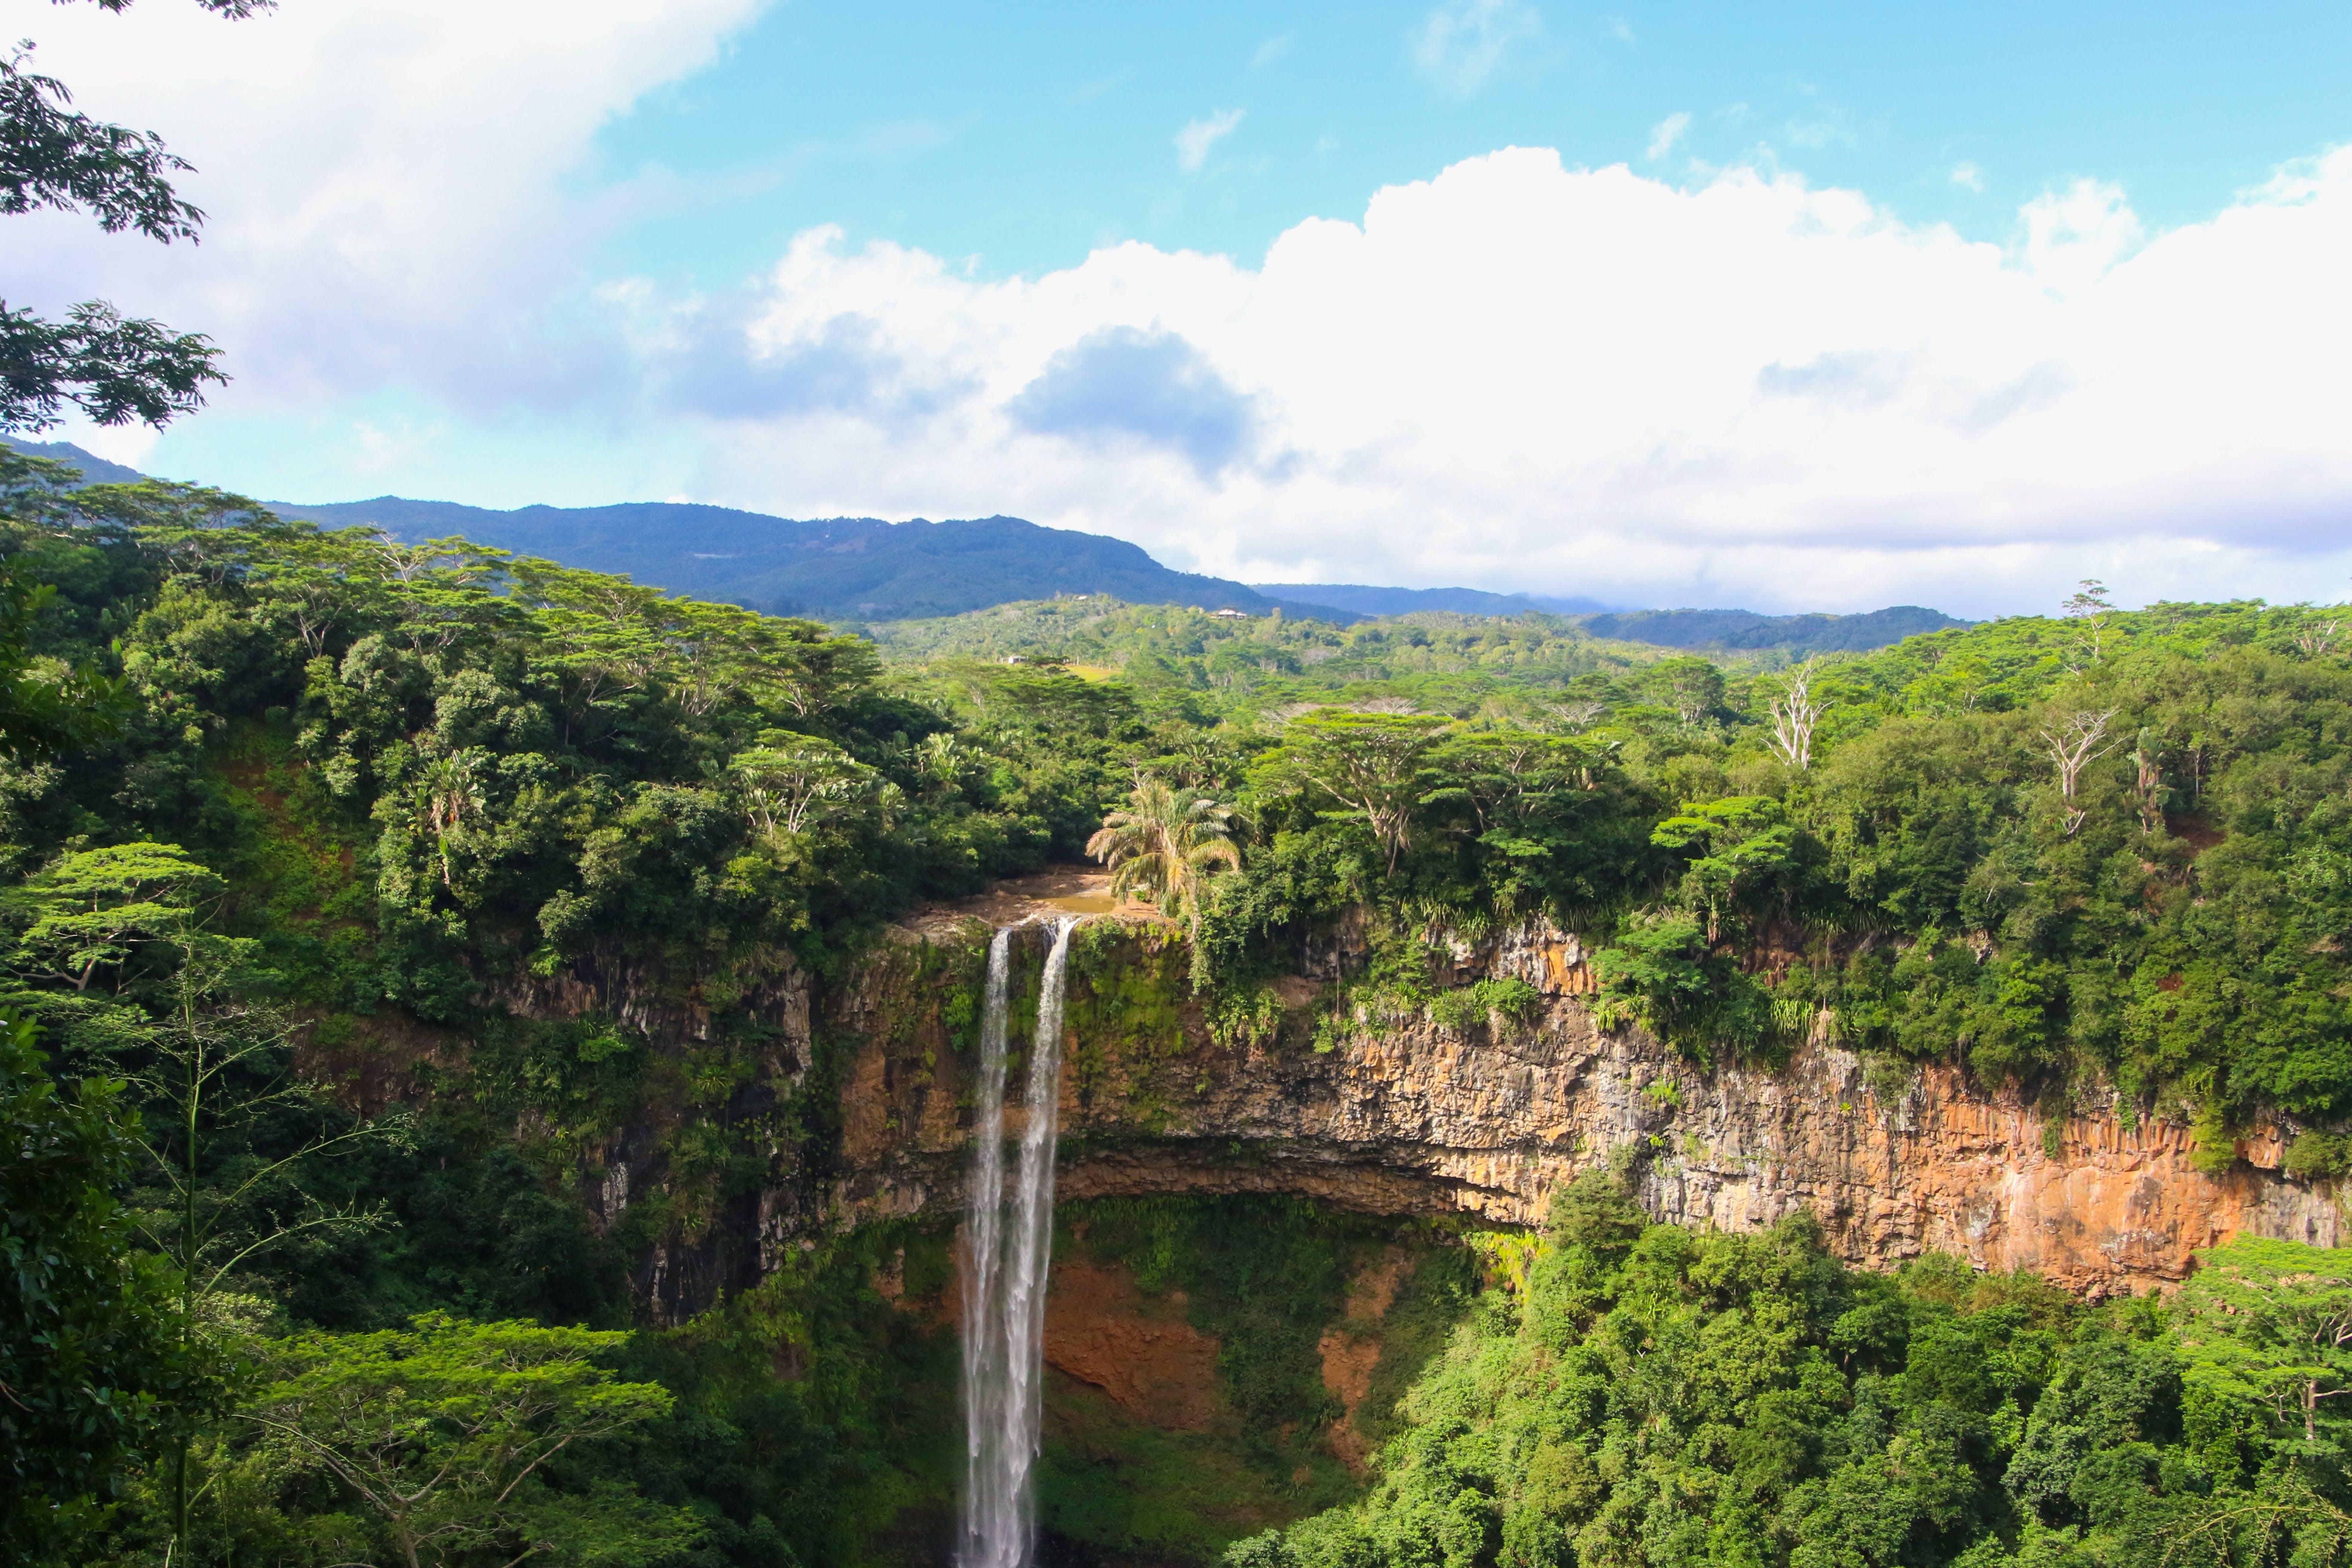 Fotos de stock gratuitas de arboles, bosque, cascada, escénico